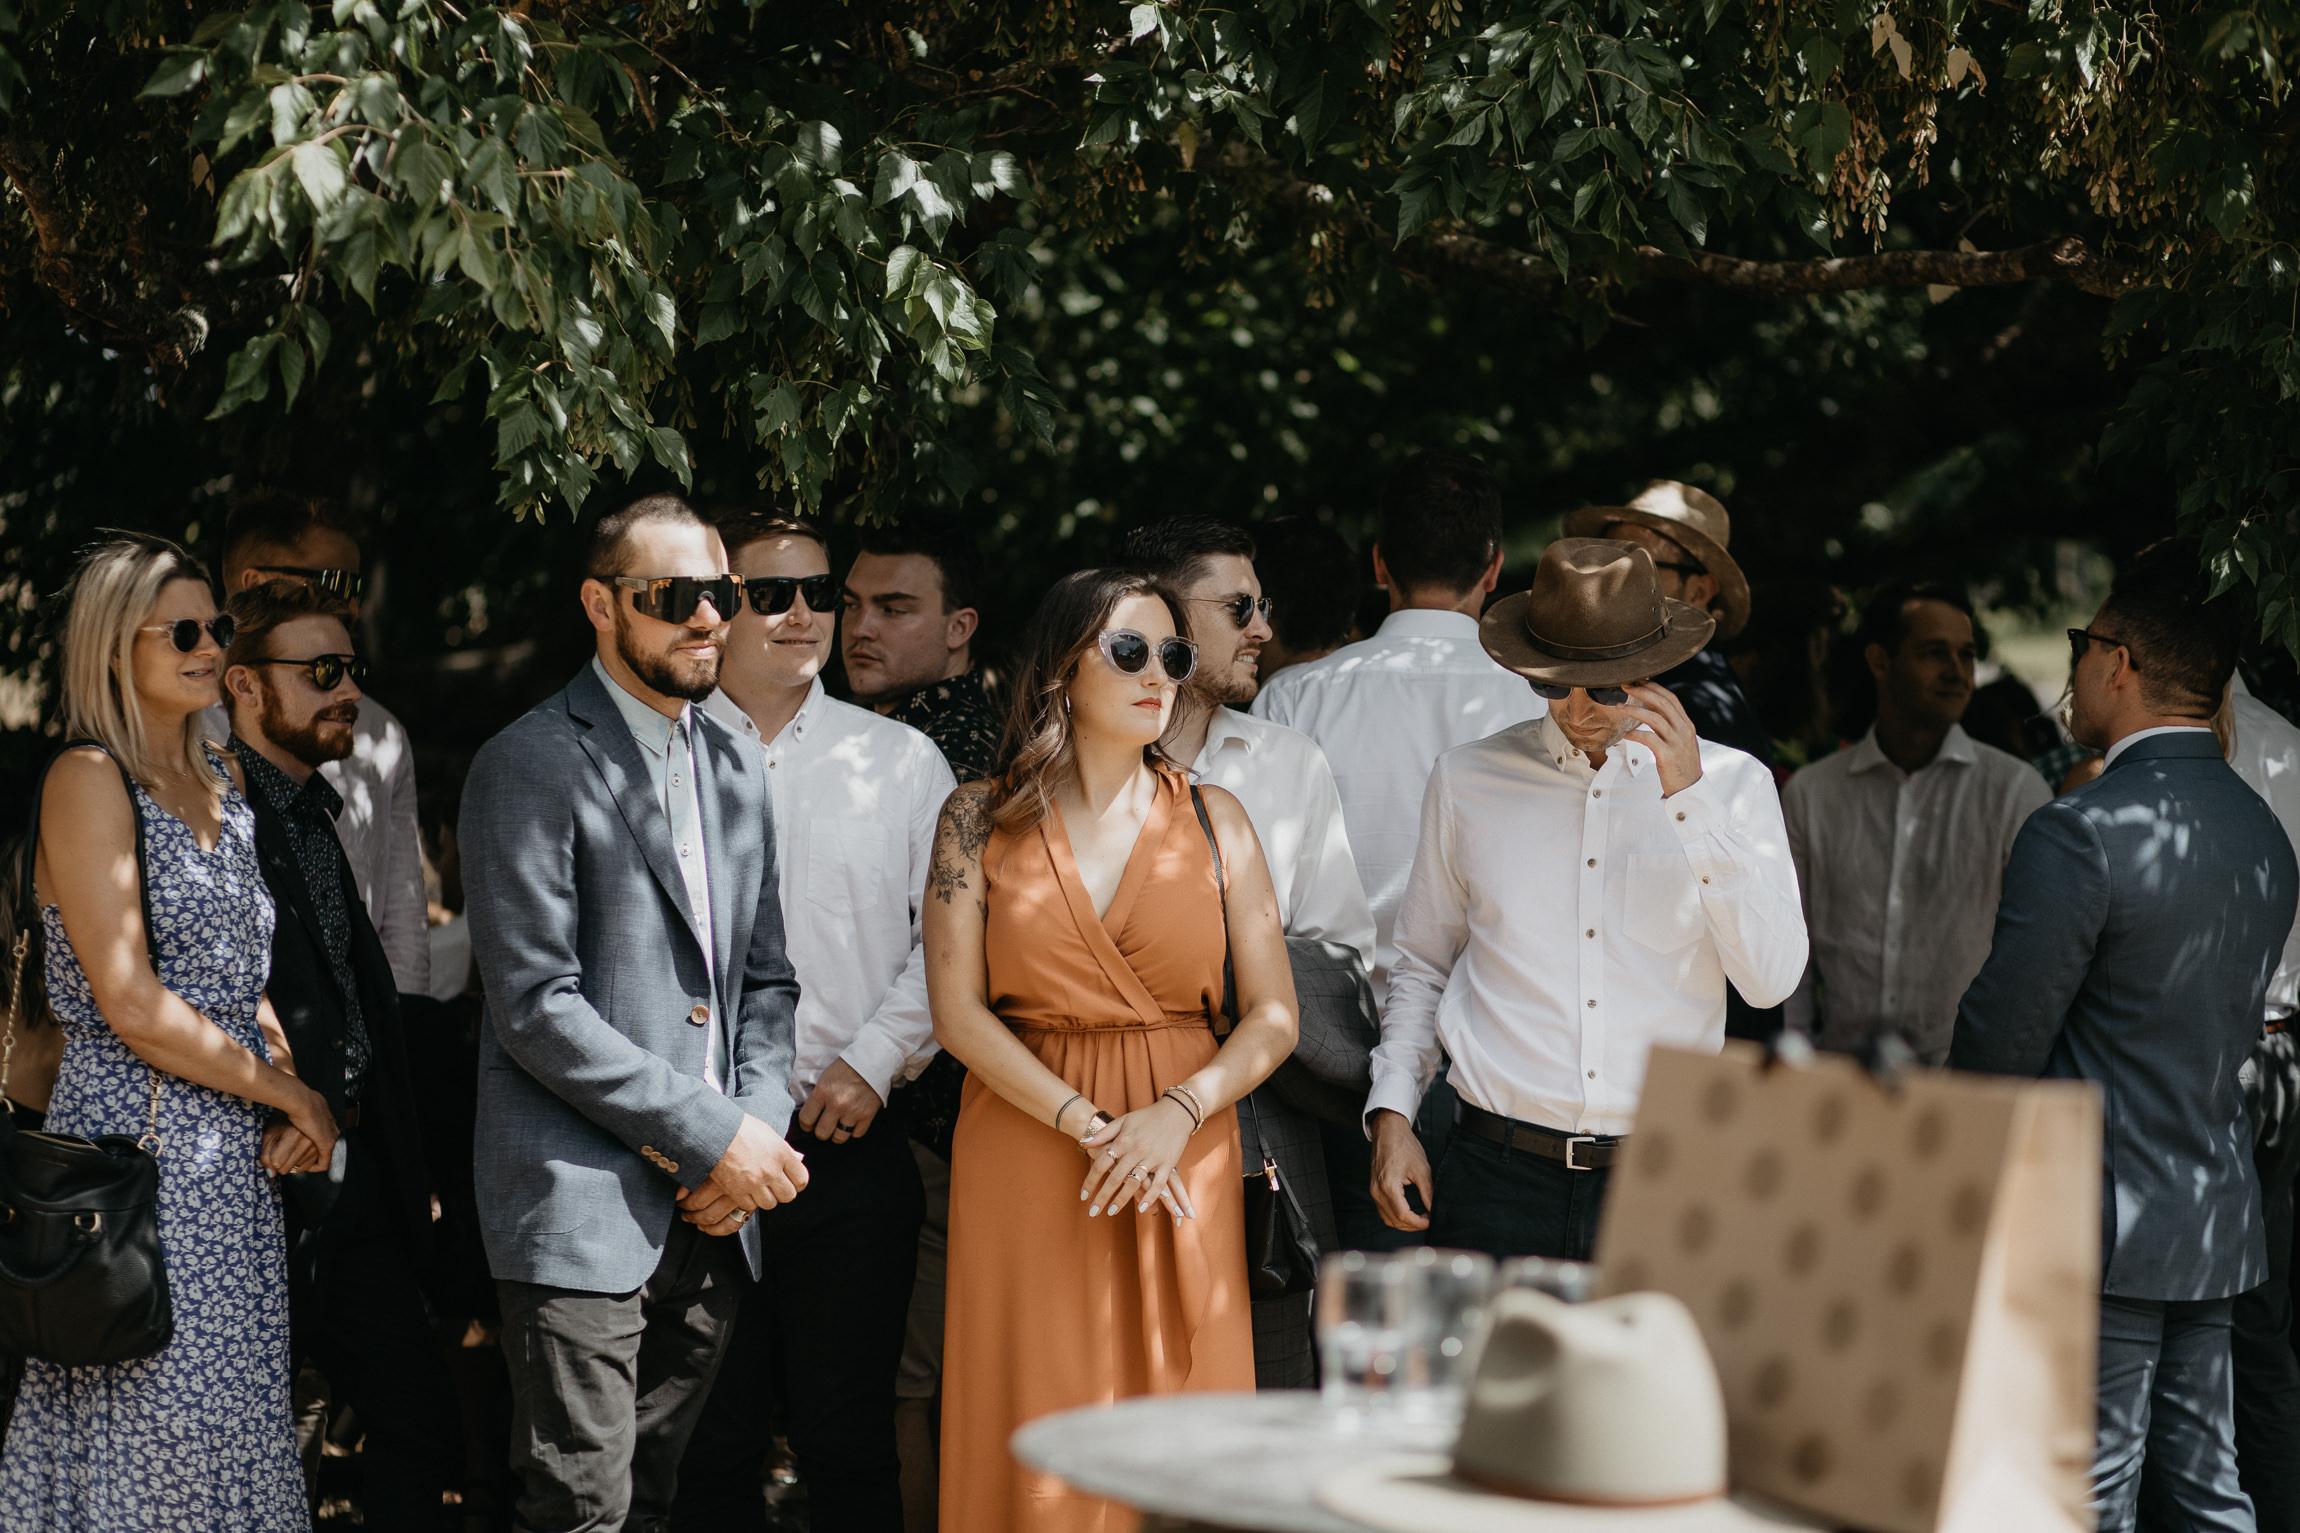 oldforestschool-wedding-blog-94.jpg